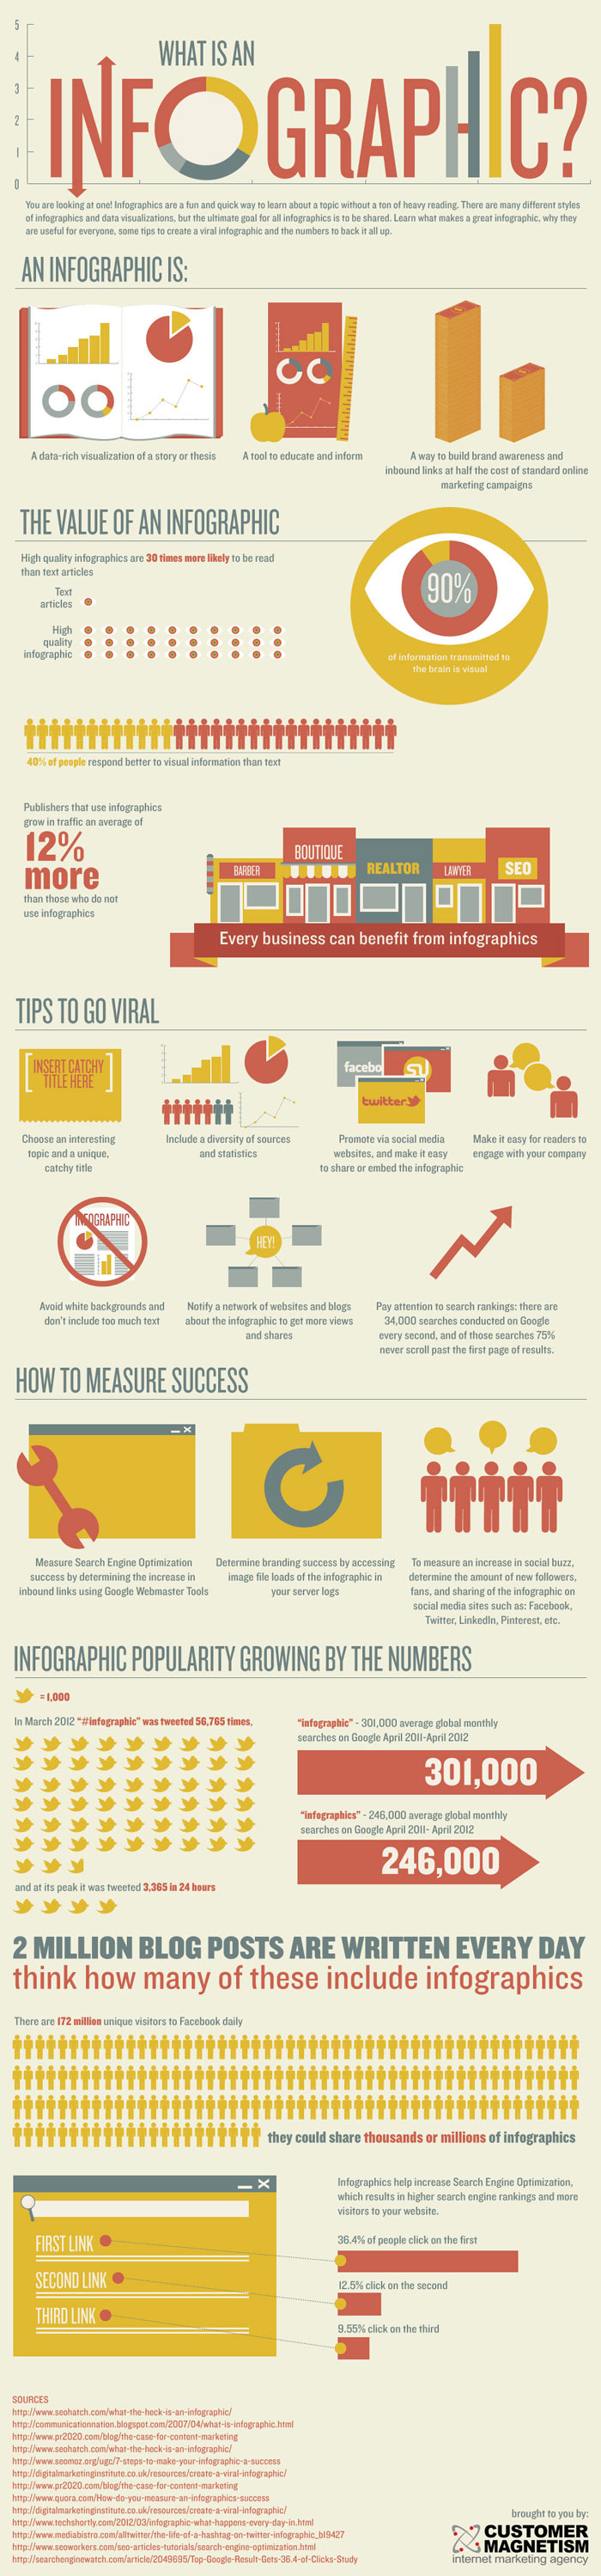 infographic effectiveness